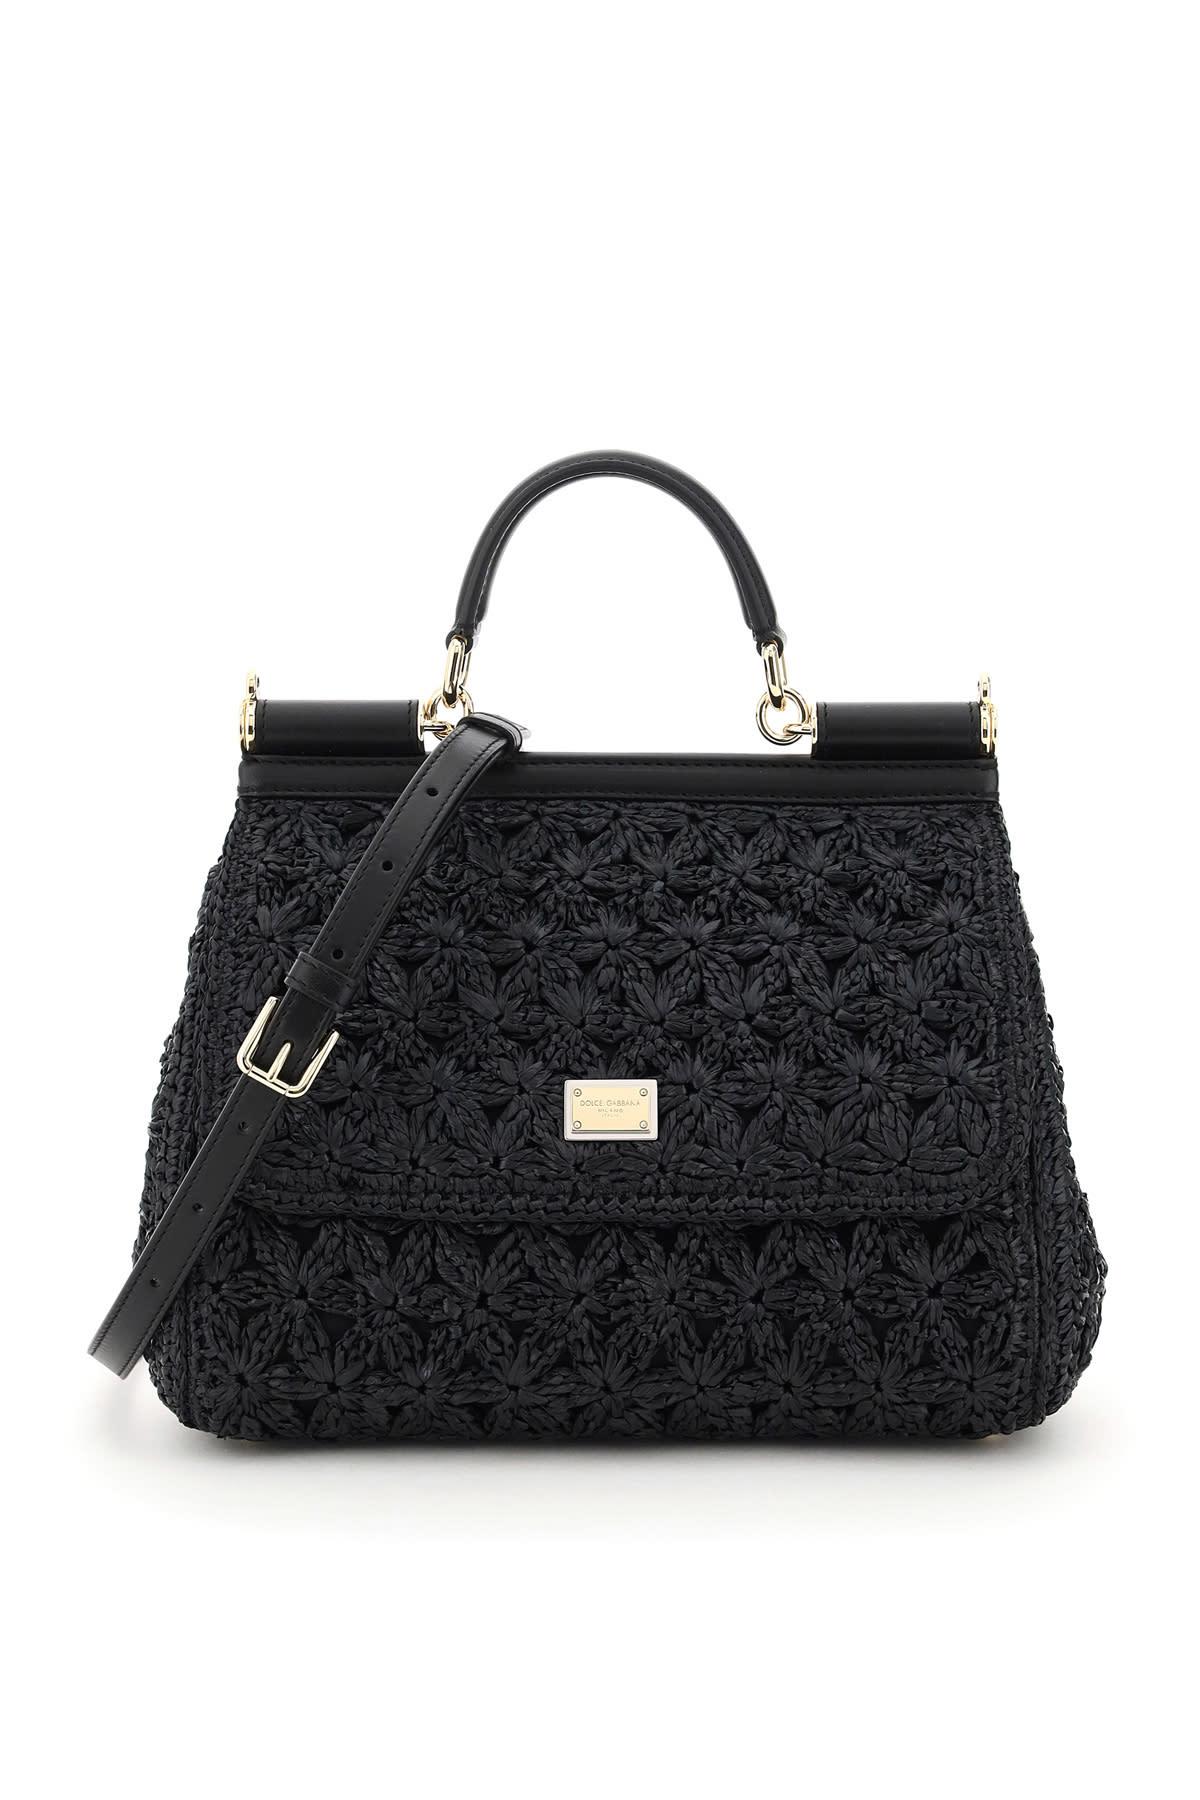 Dolce & Gabbana Leathers SICILY MEDIUM BAG CROCHET RAFFIA